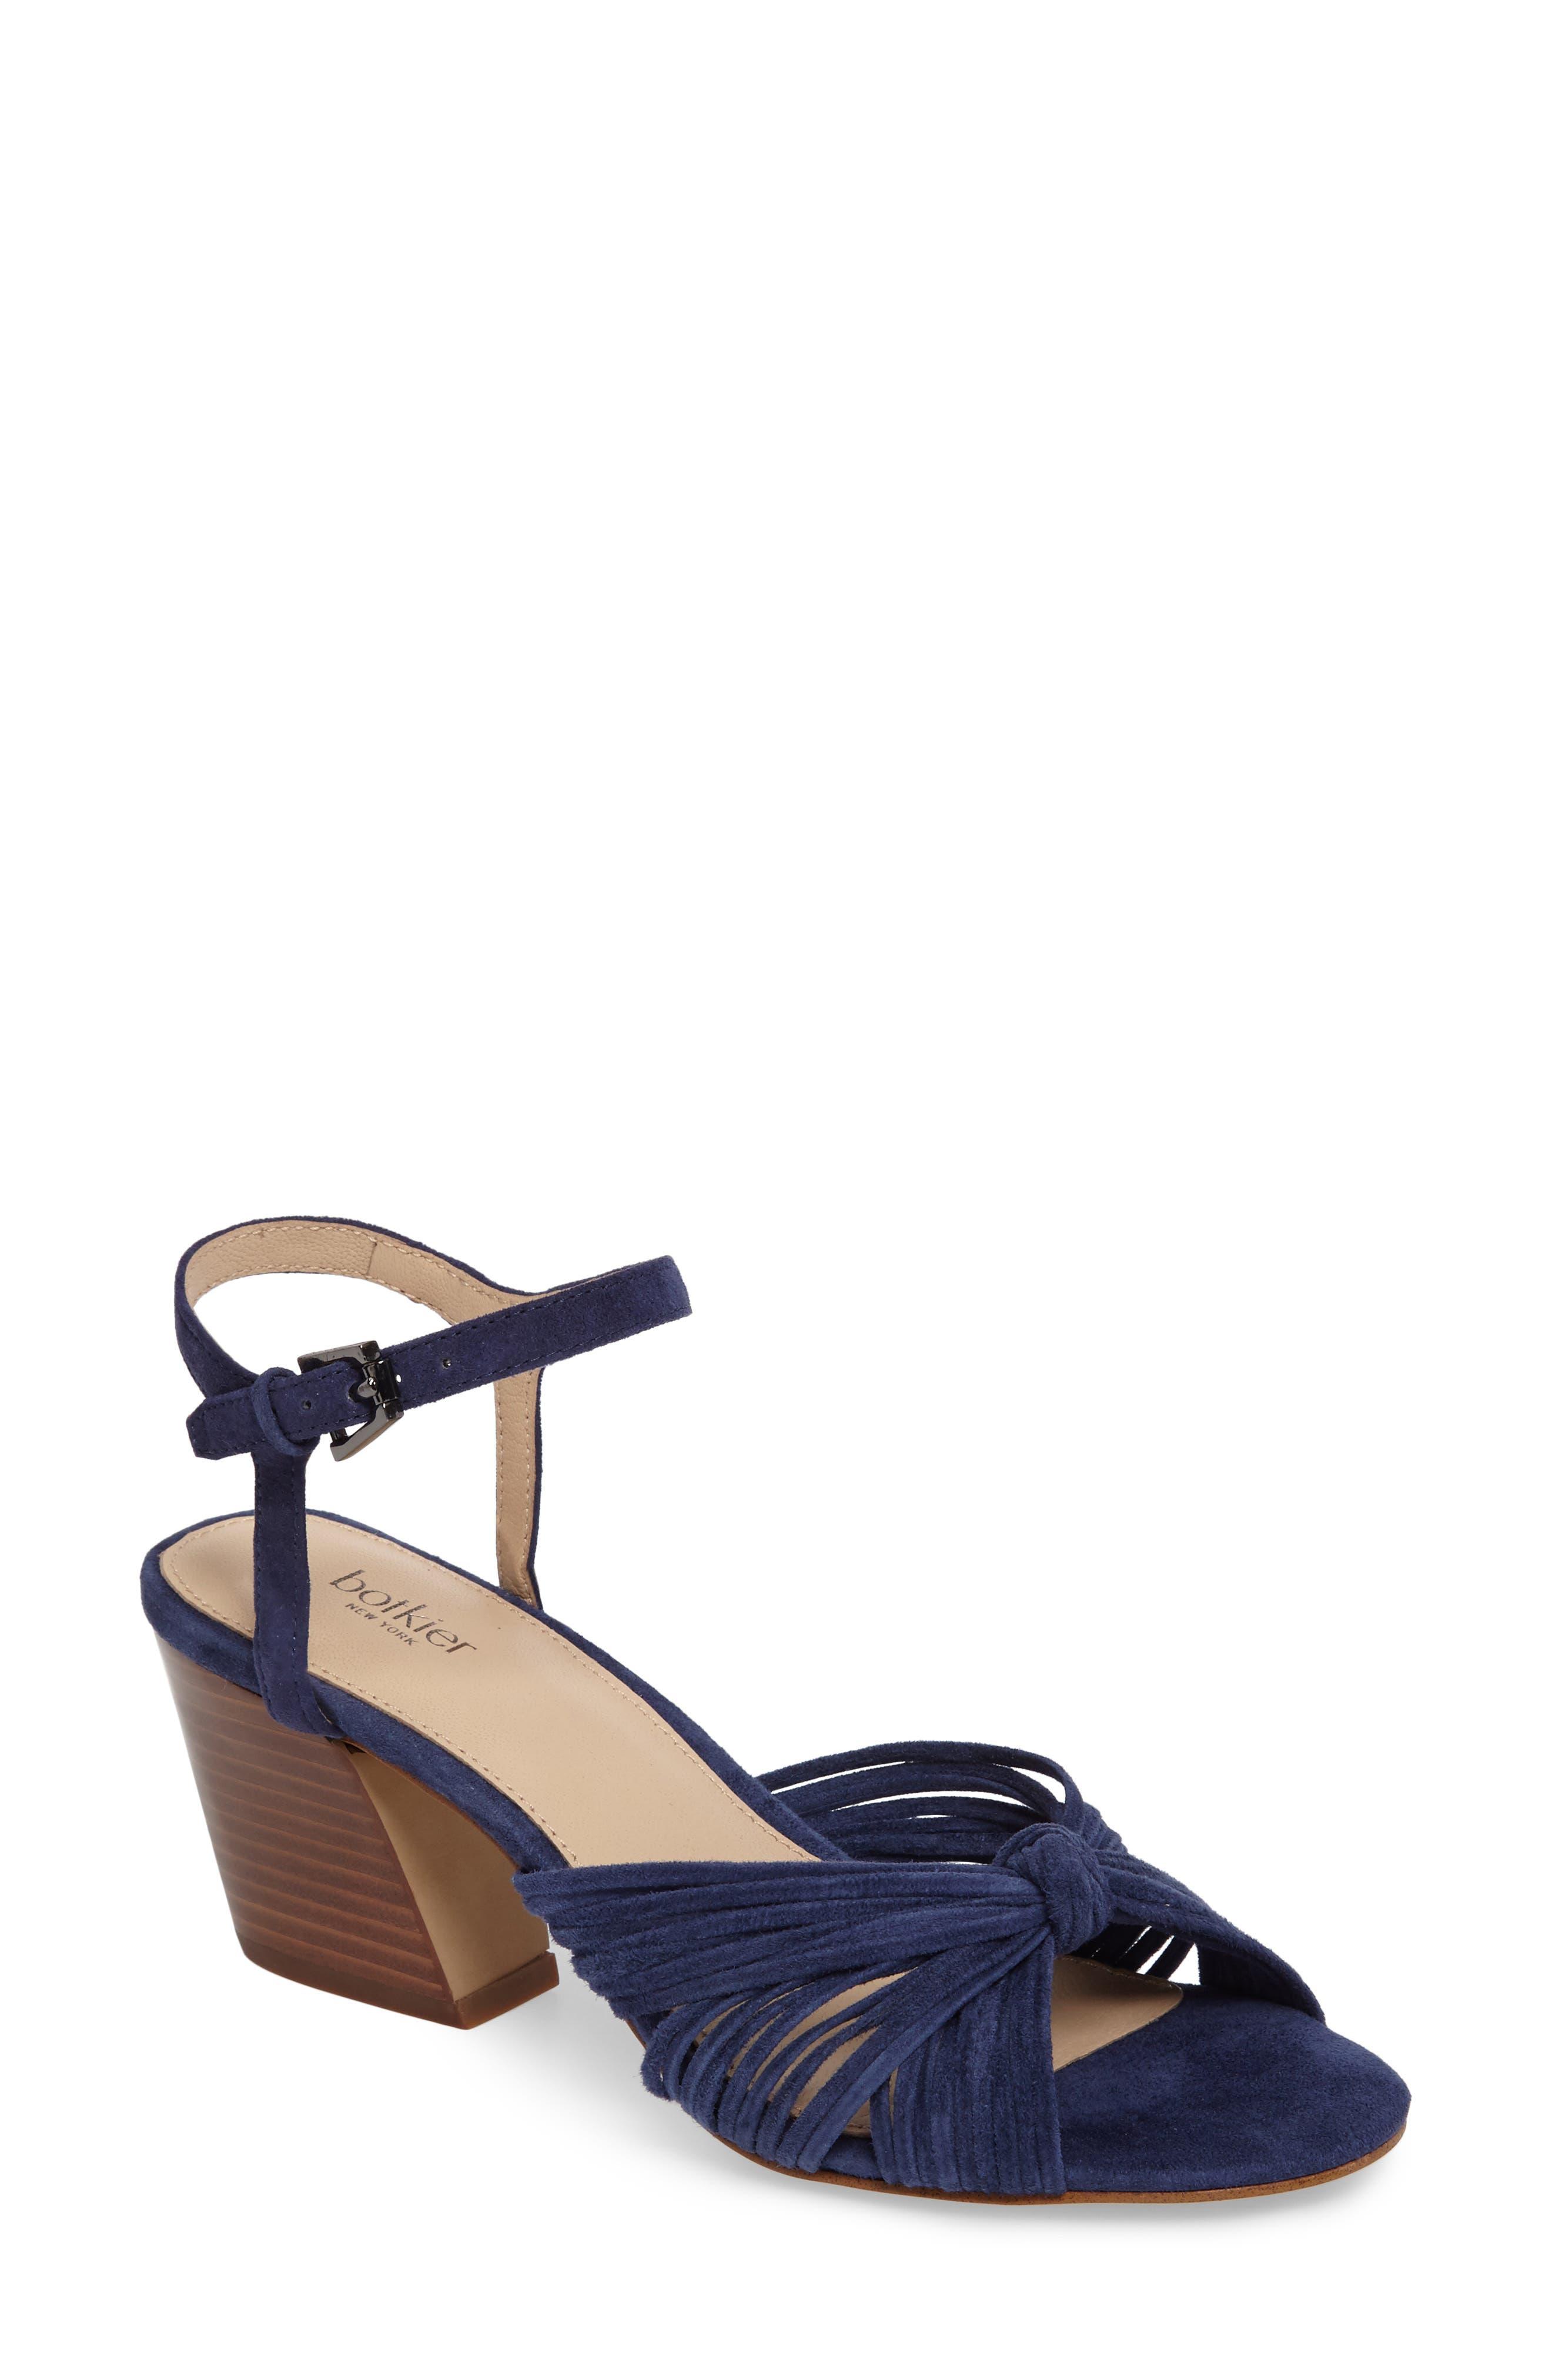 Patsy Block Heel Sandal,                             Main thumbnail 1, color,                             Navy